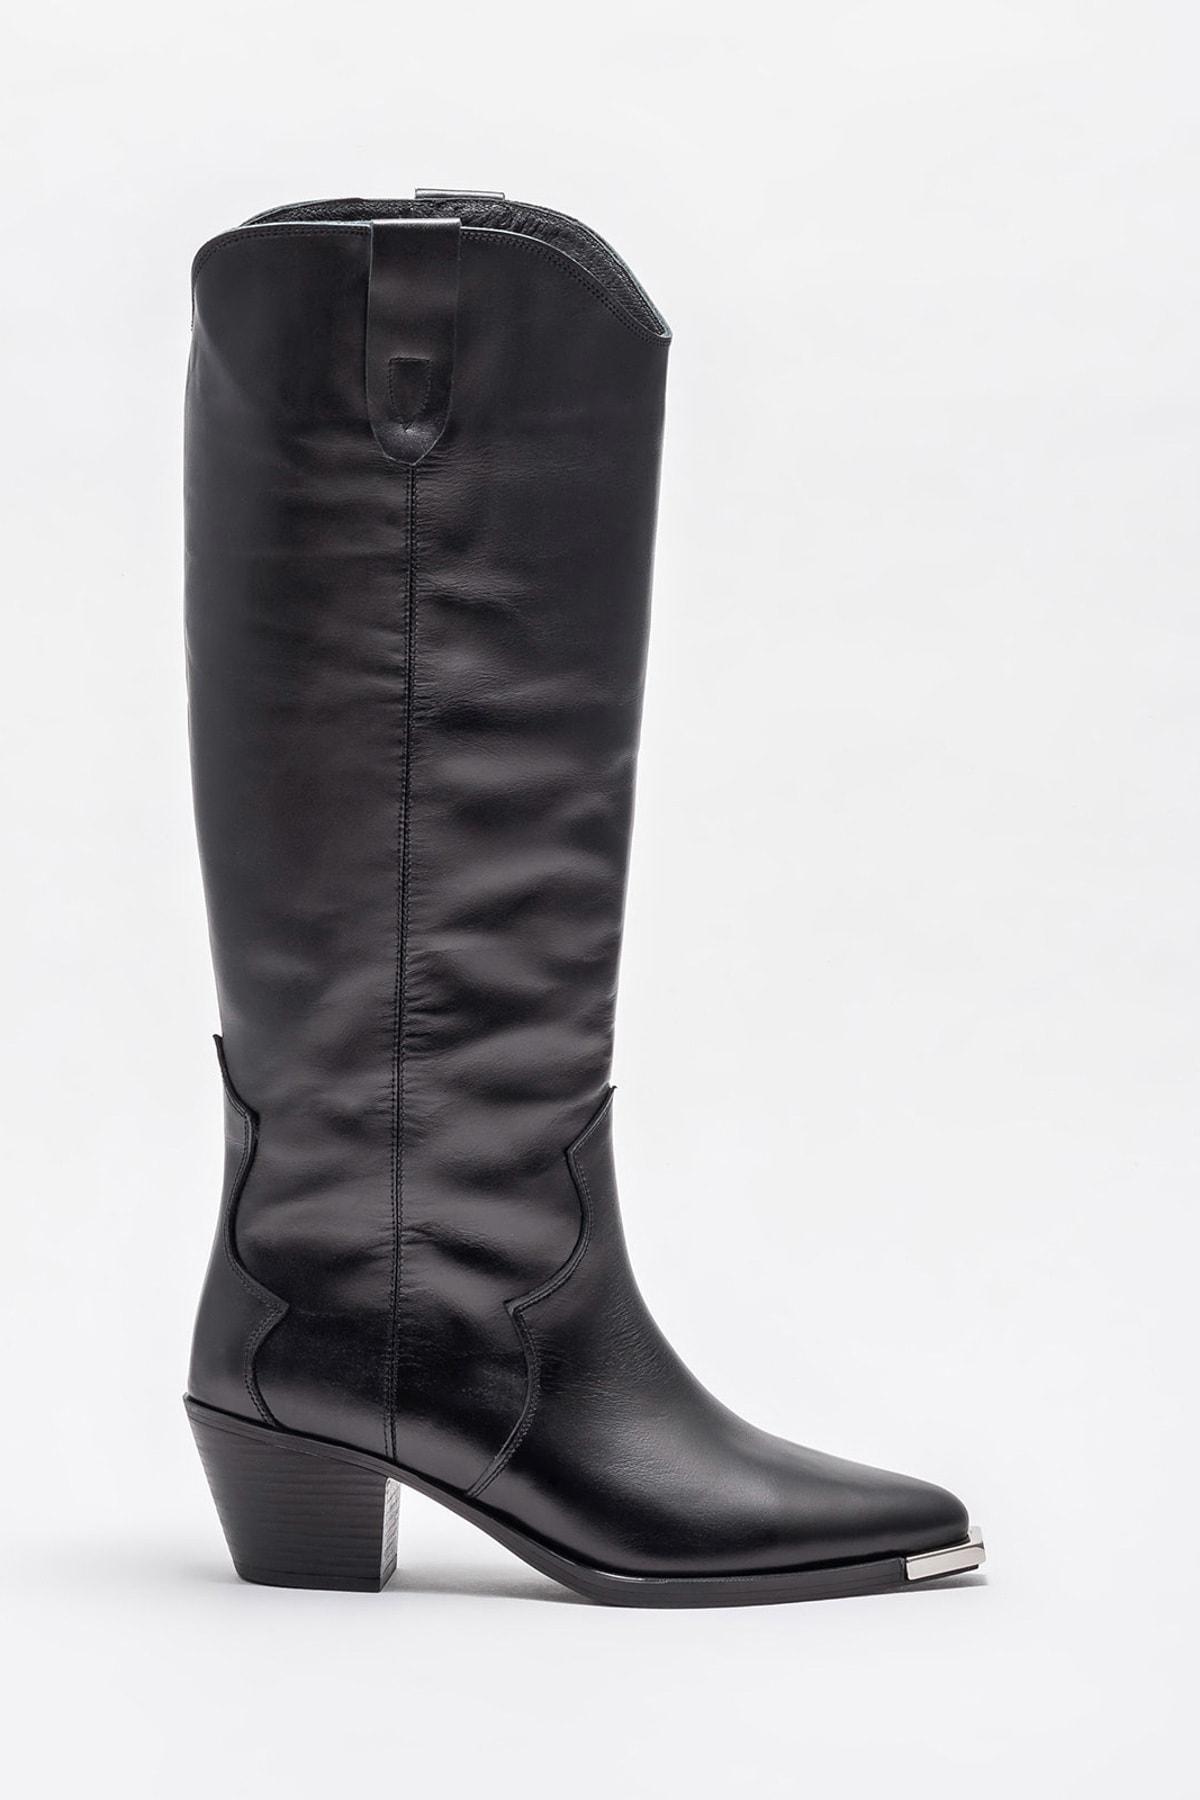 Elle Shoes Kadın Çizme 20KBS88214 1